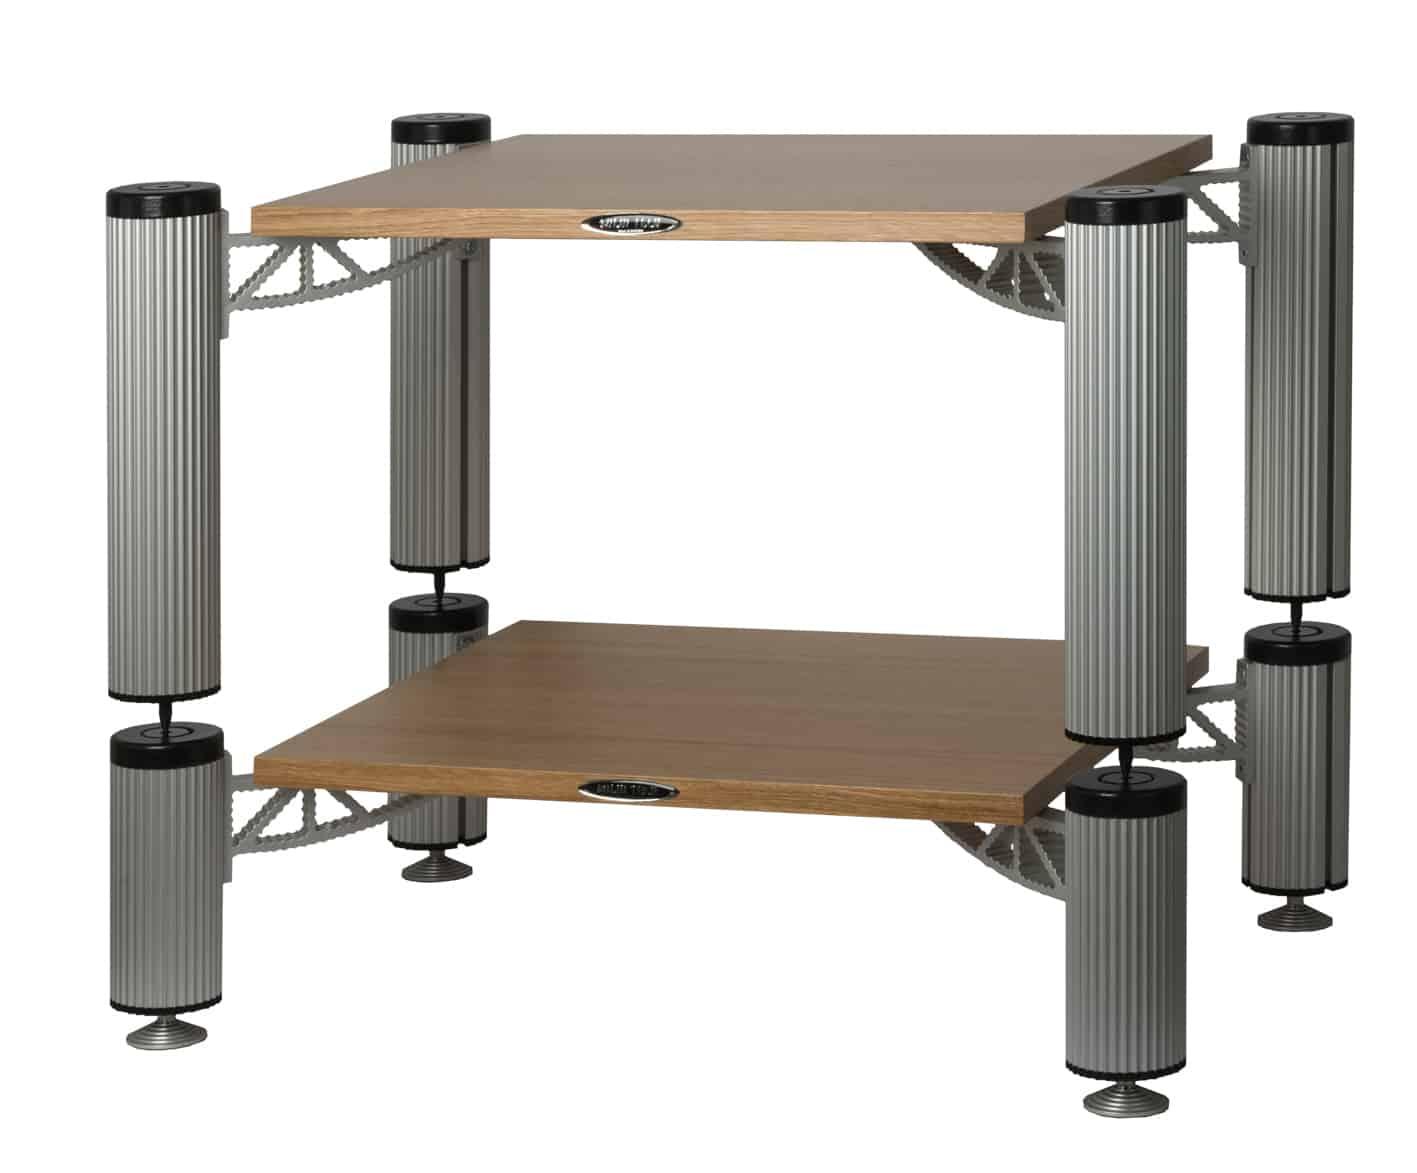 Hybrid Rack with shelves in Oak Image